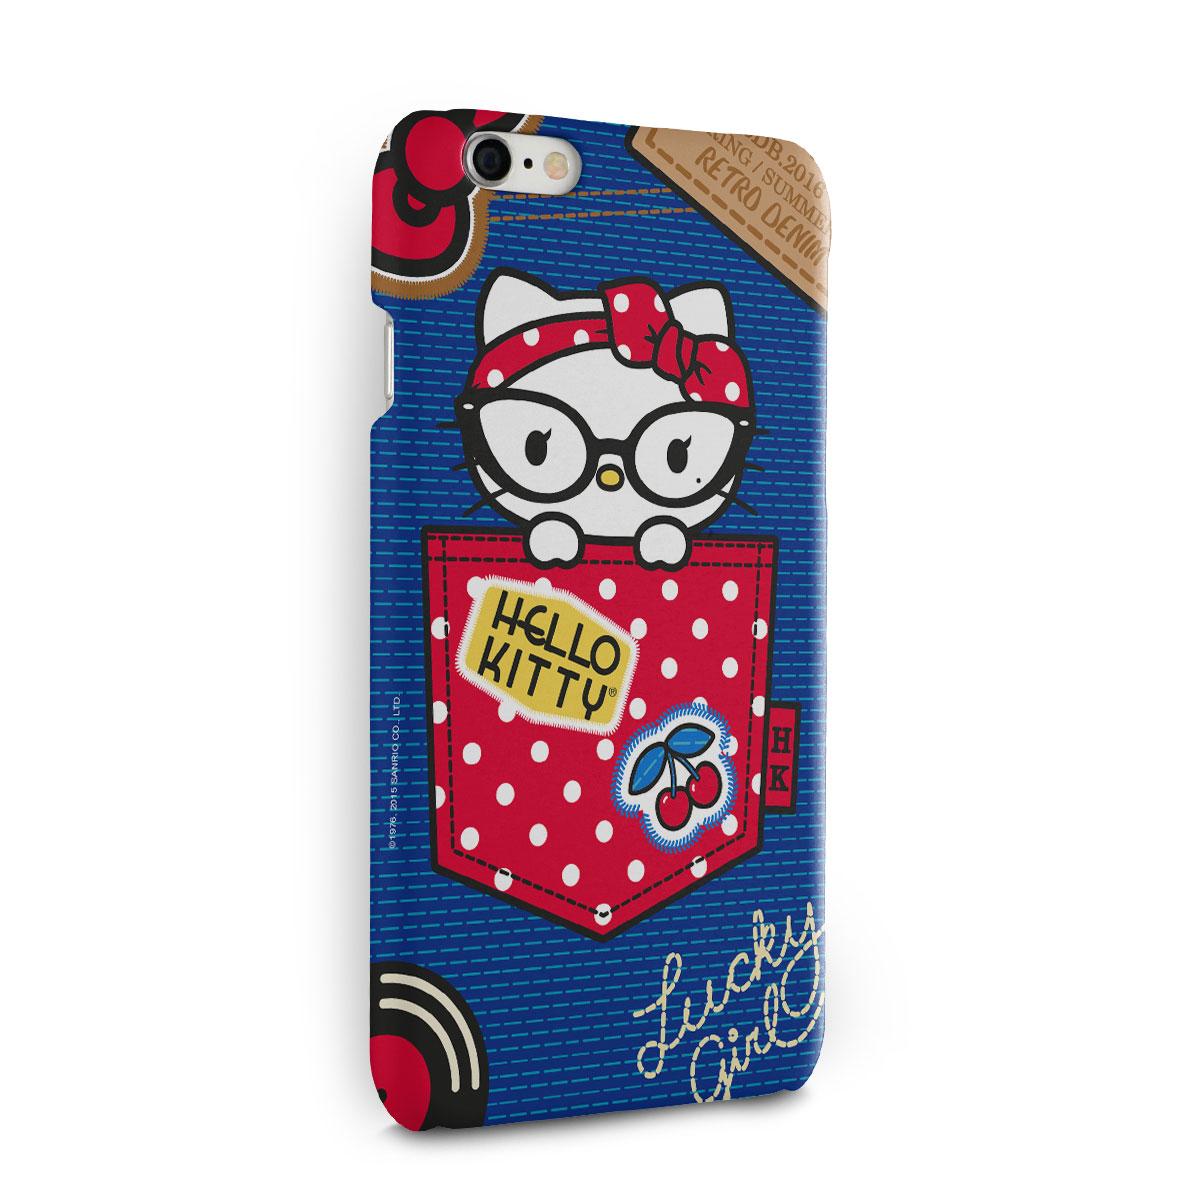 Capa para iPhone 6/6S Hello Kitty Retro Denim